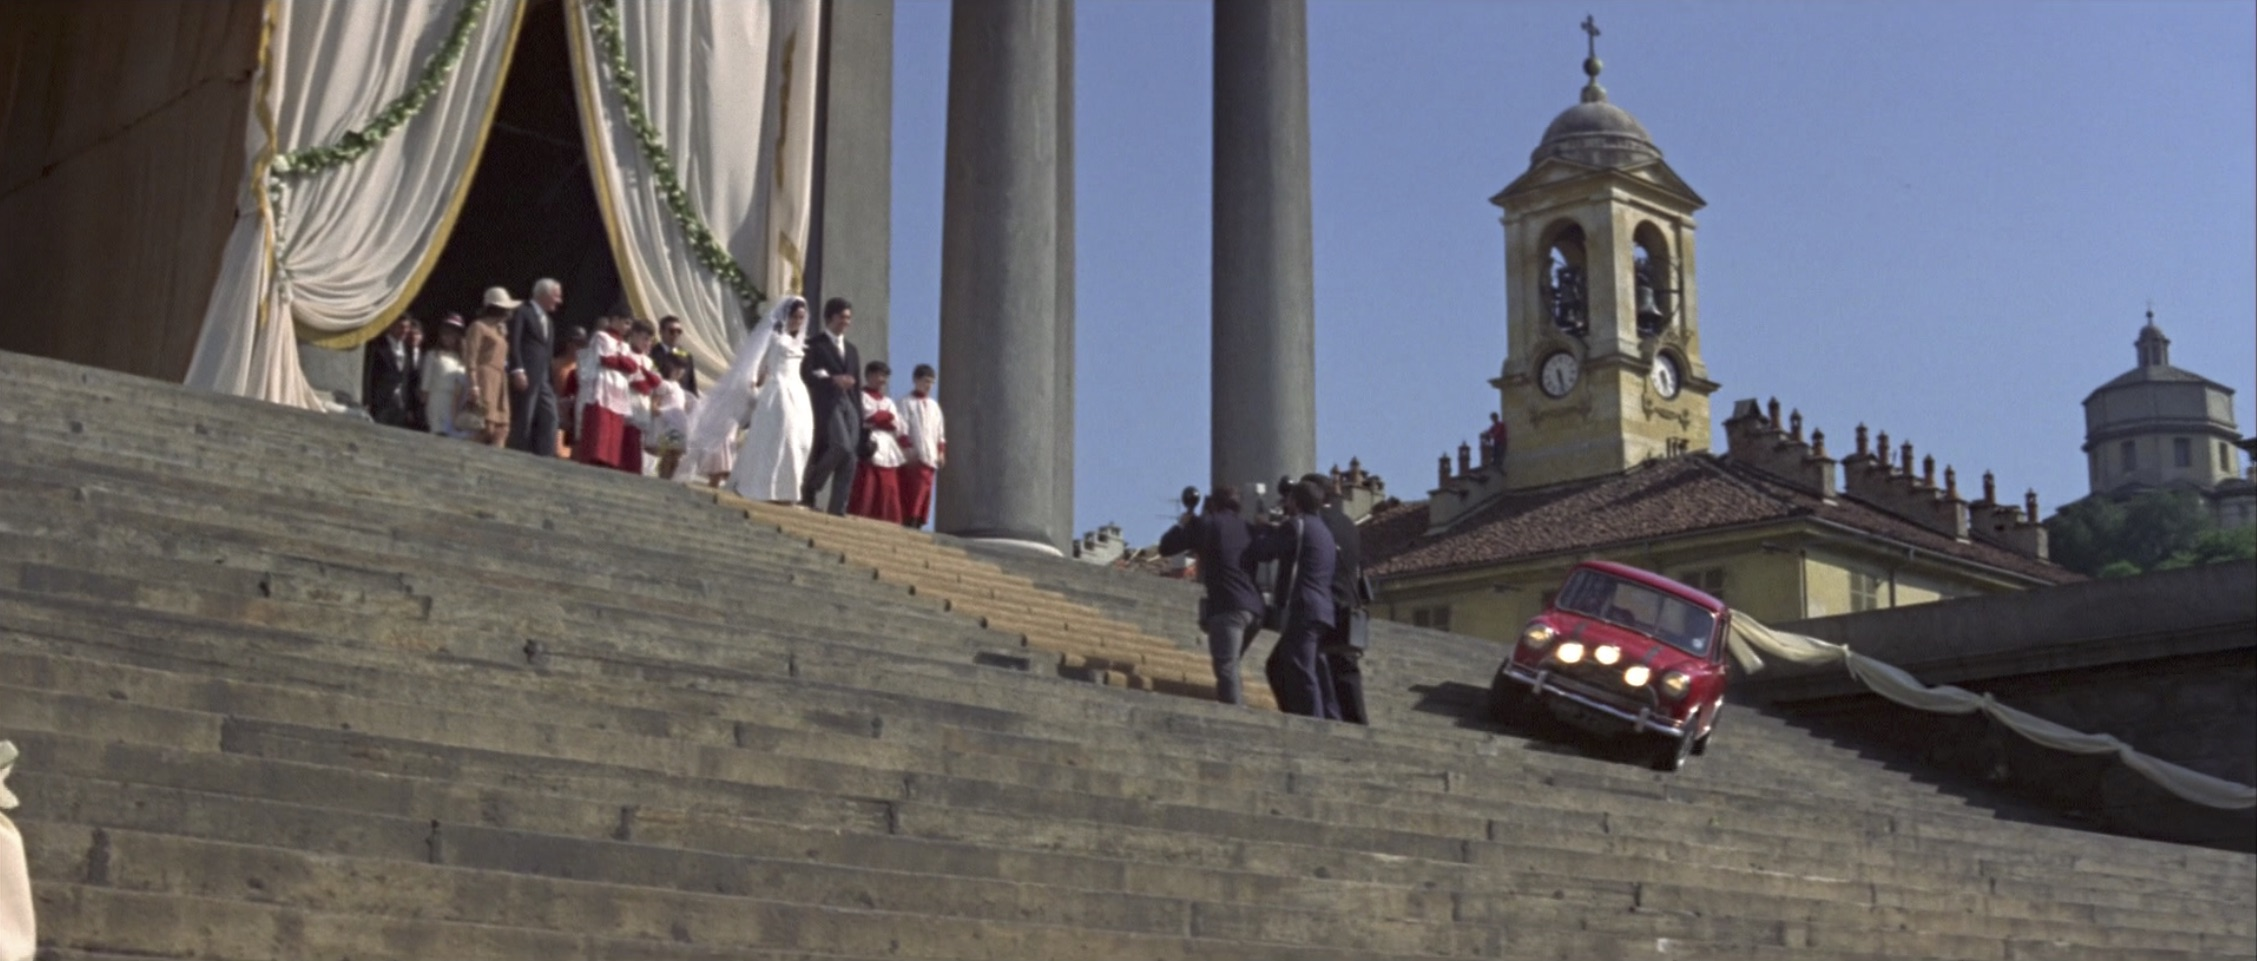 Italian Job chase scene